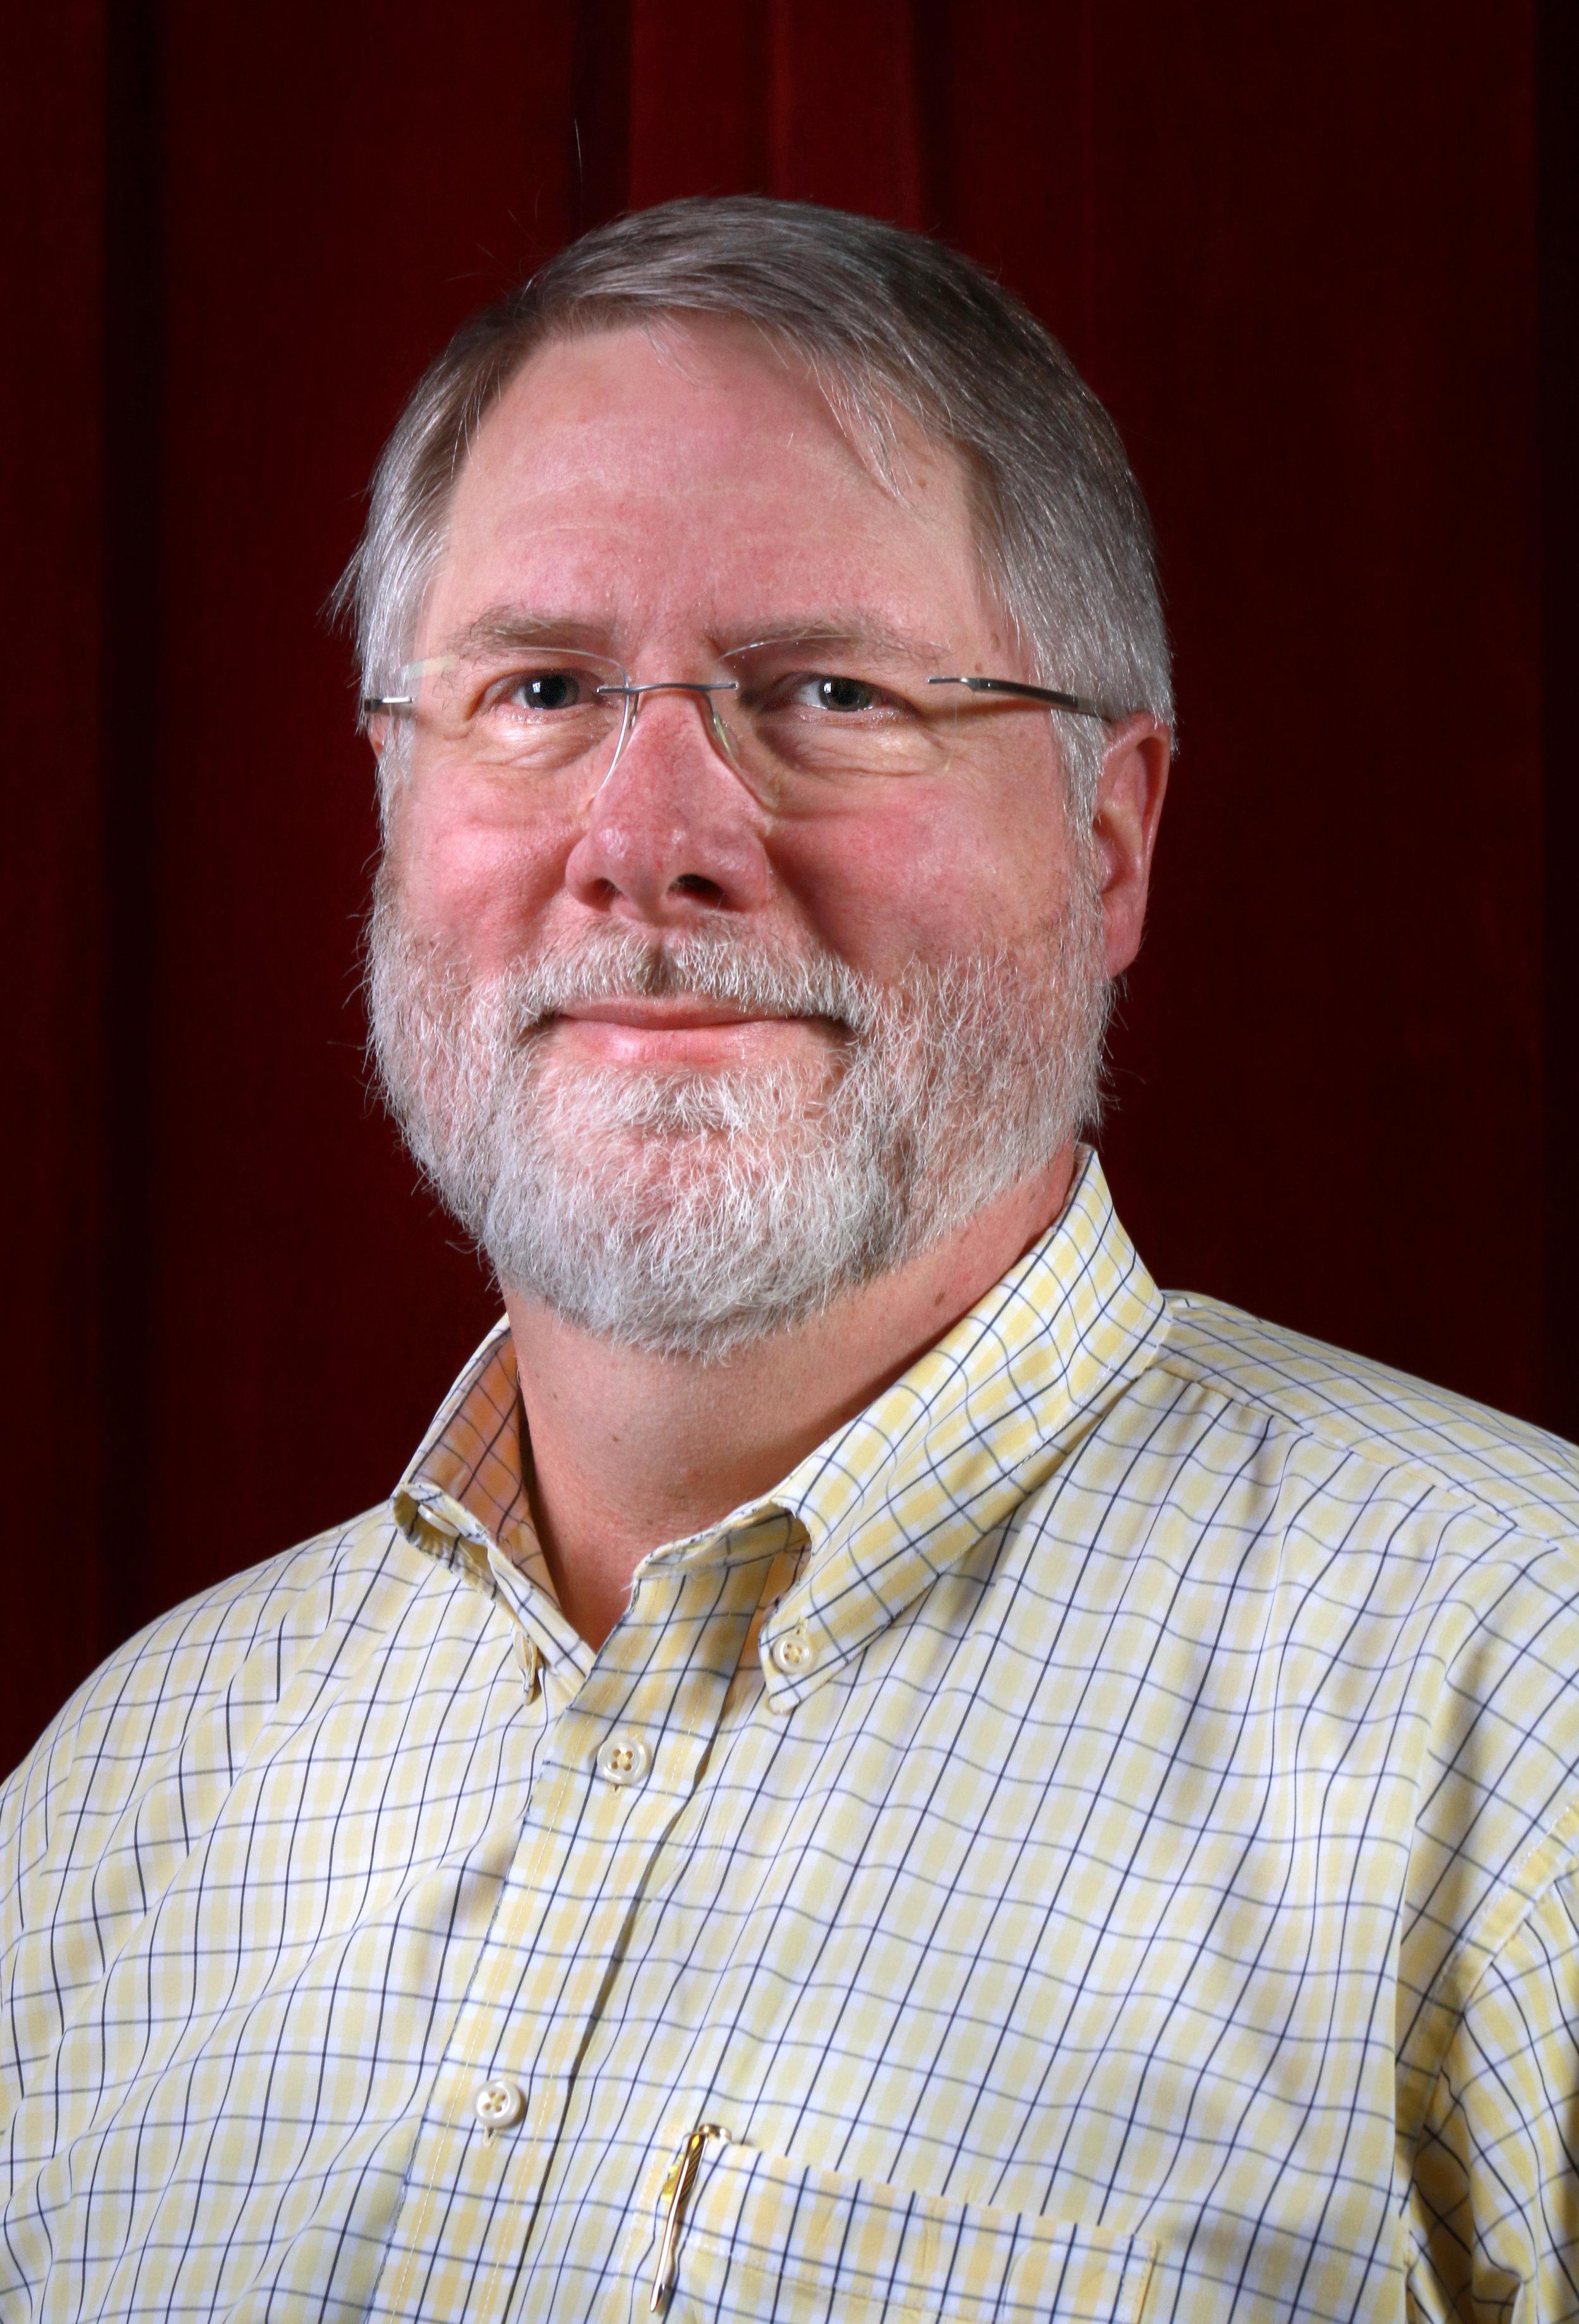 Jeffrey S. Philpott, Ph.D. (photo by Seattle University)